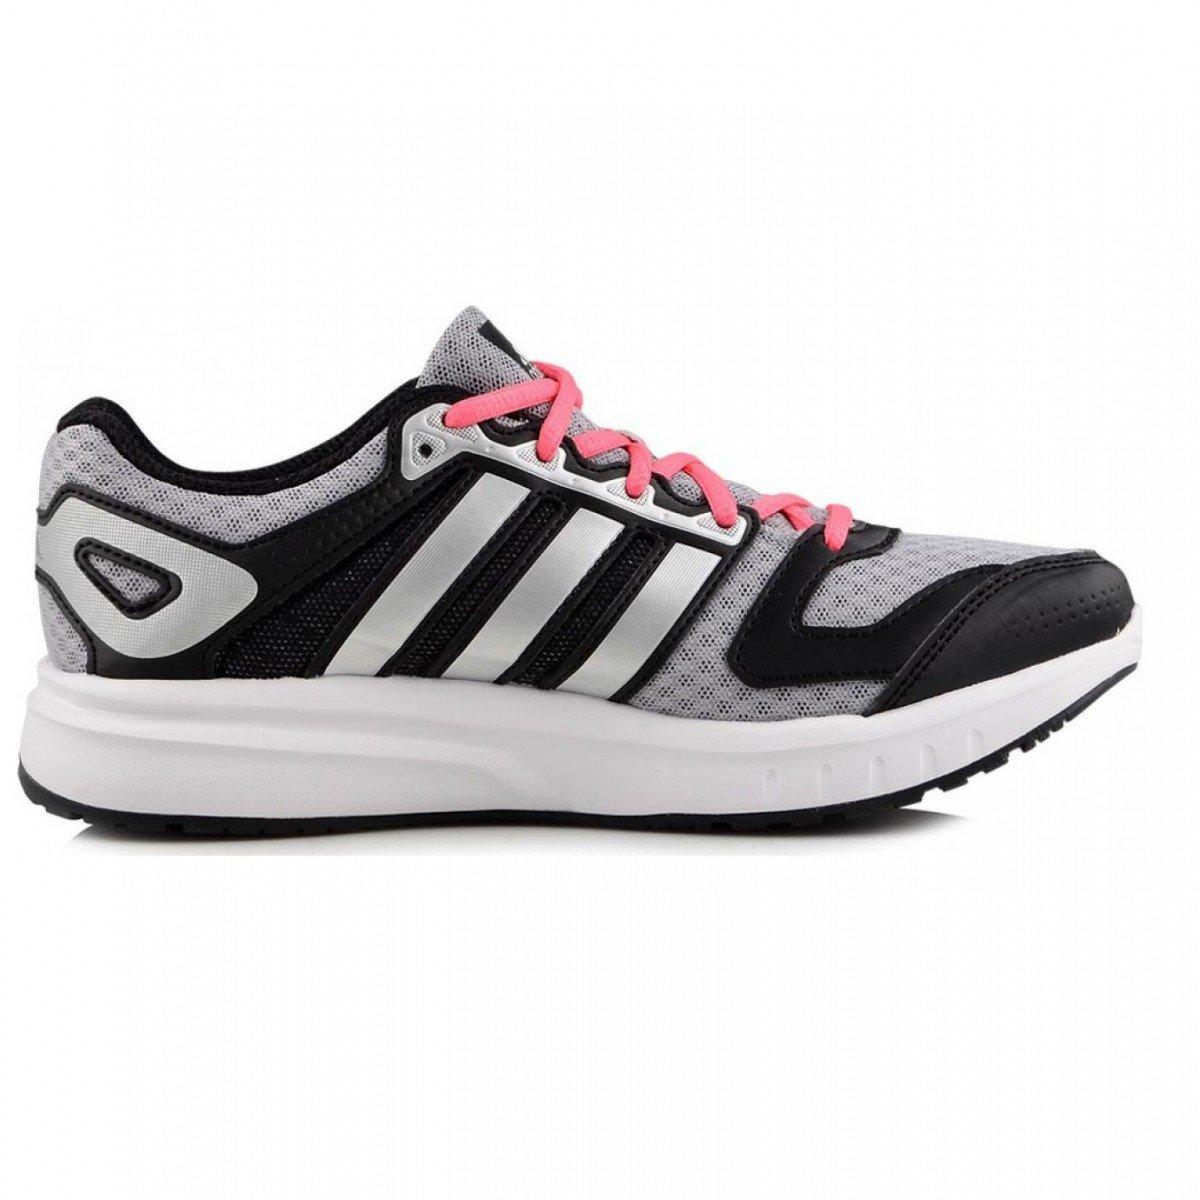 d3ef3e7b747 Tênis Adidas Galaxy Feminino - Prata e Rosa ...